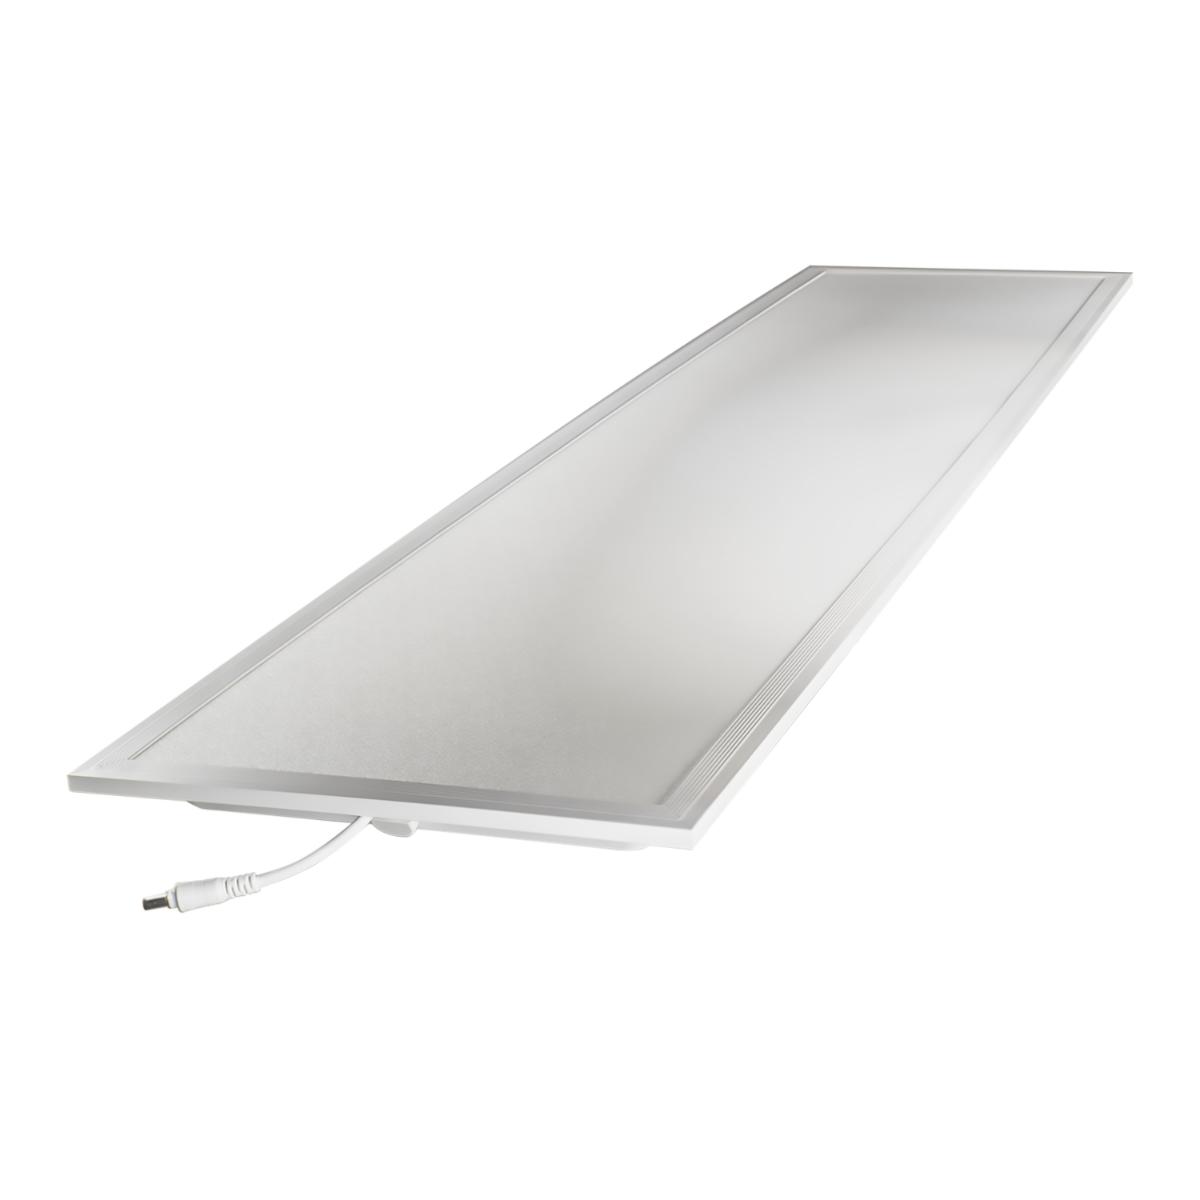 Noxion LED Panel Delta Pro Highlum V2.0 Xitanium DALI 40W 30x120cm 6500K 5480lm UGR <19   Dali Dimmable - Daylight - Replaces 2x36W